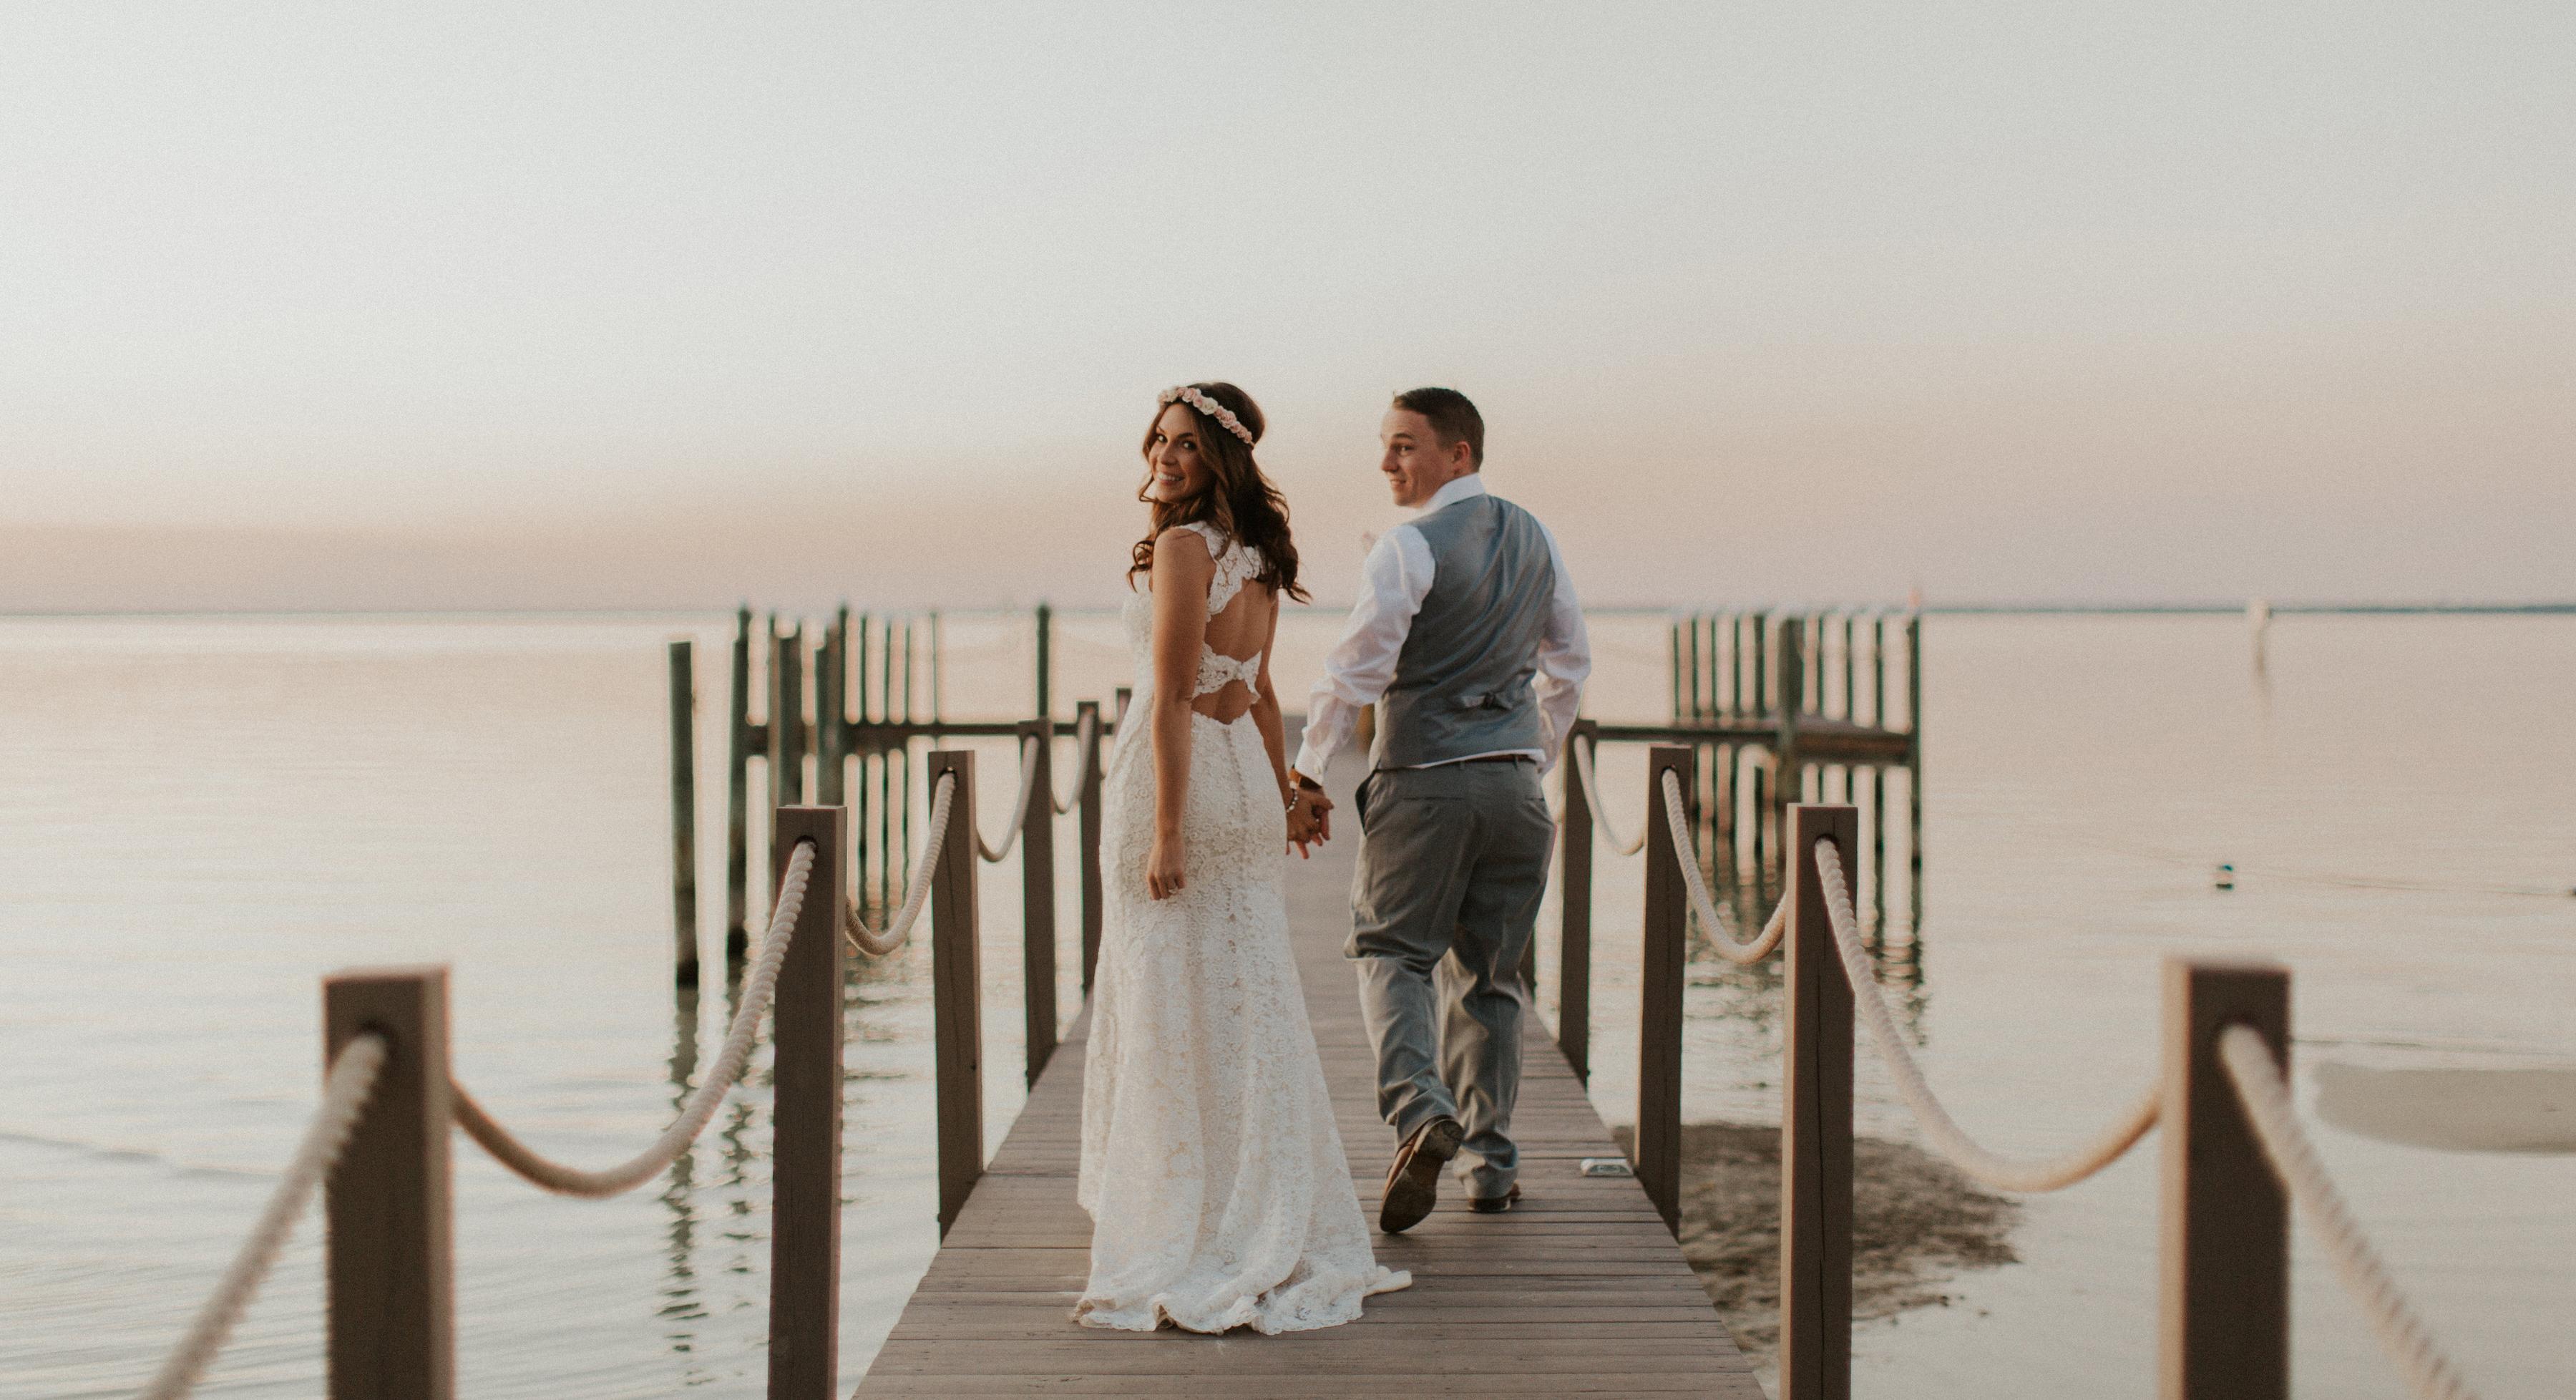 Bride Wearing Budget-Friendly Wedding Dress Called Hope by Rebecca Ingram